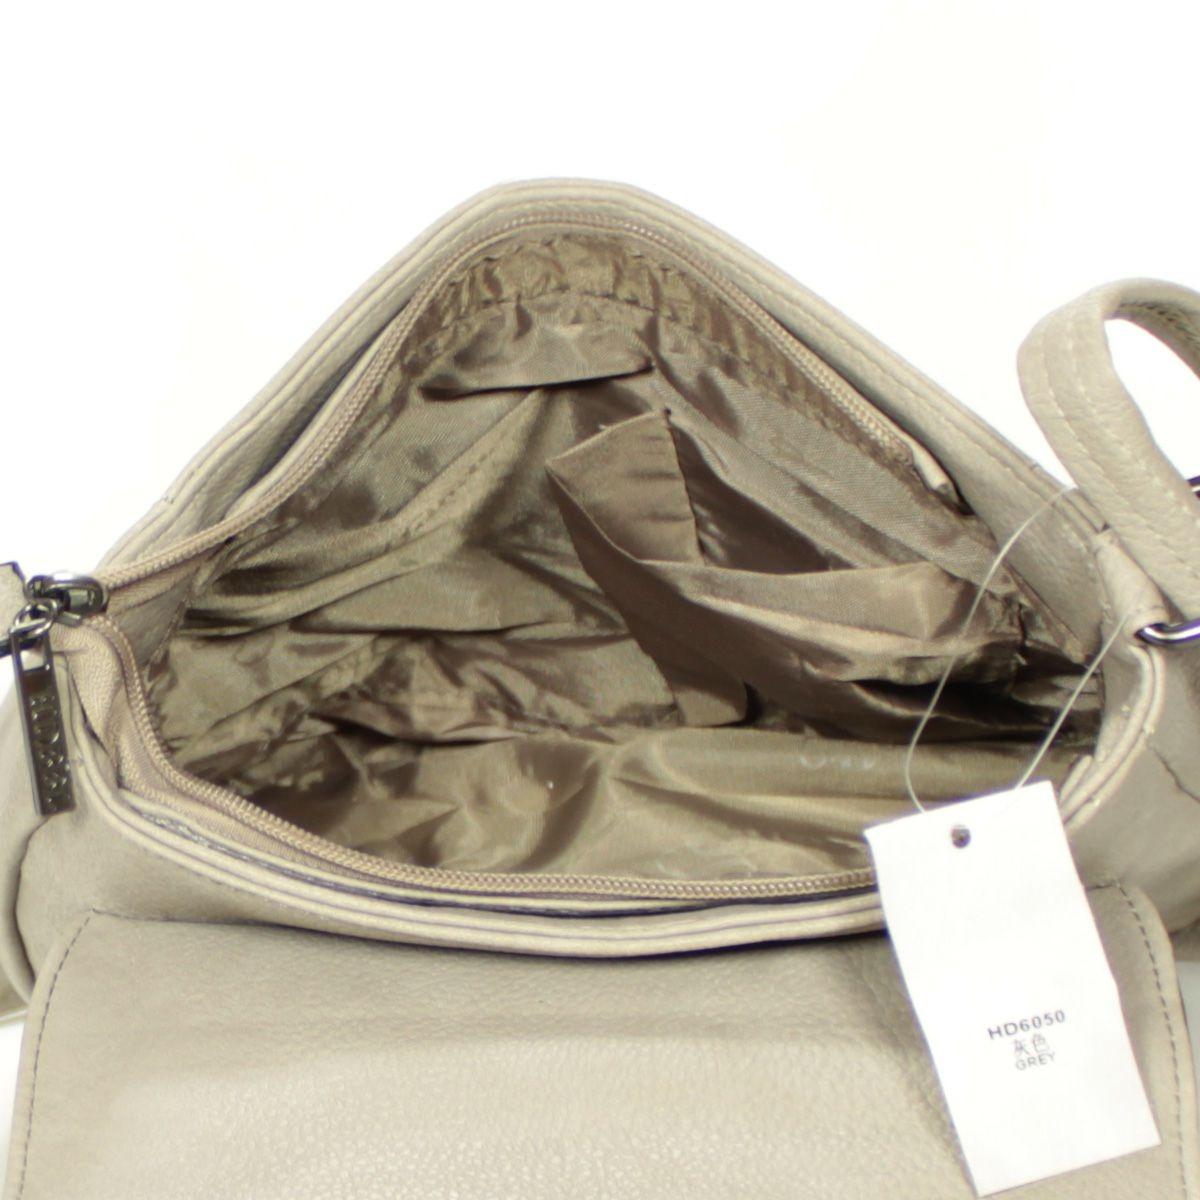 34bb2714a bolsa carteiro feminina transversal couro sintetico franja. Carregando zoom...  bolsa feminina couro sintetico. Carregando zoom.